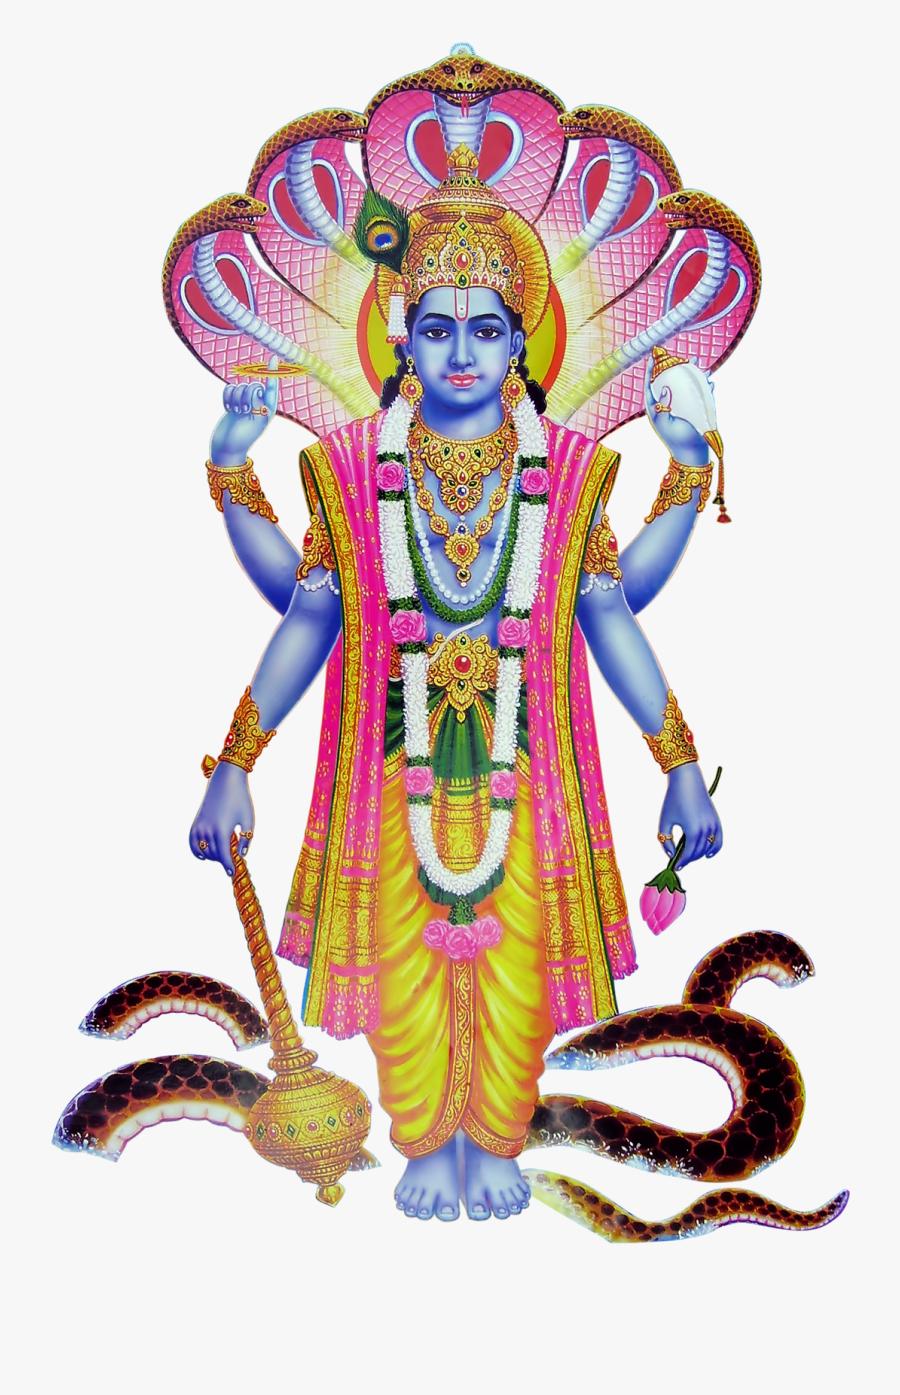 God Clipart Lord Venkateswara - God Of Vishnu Png, Transparent Clipart